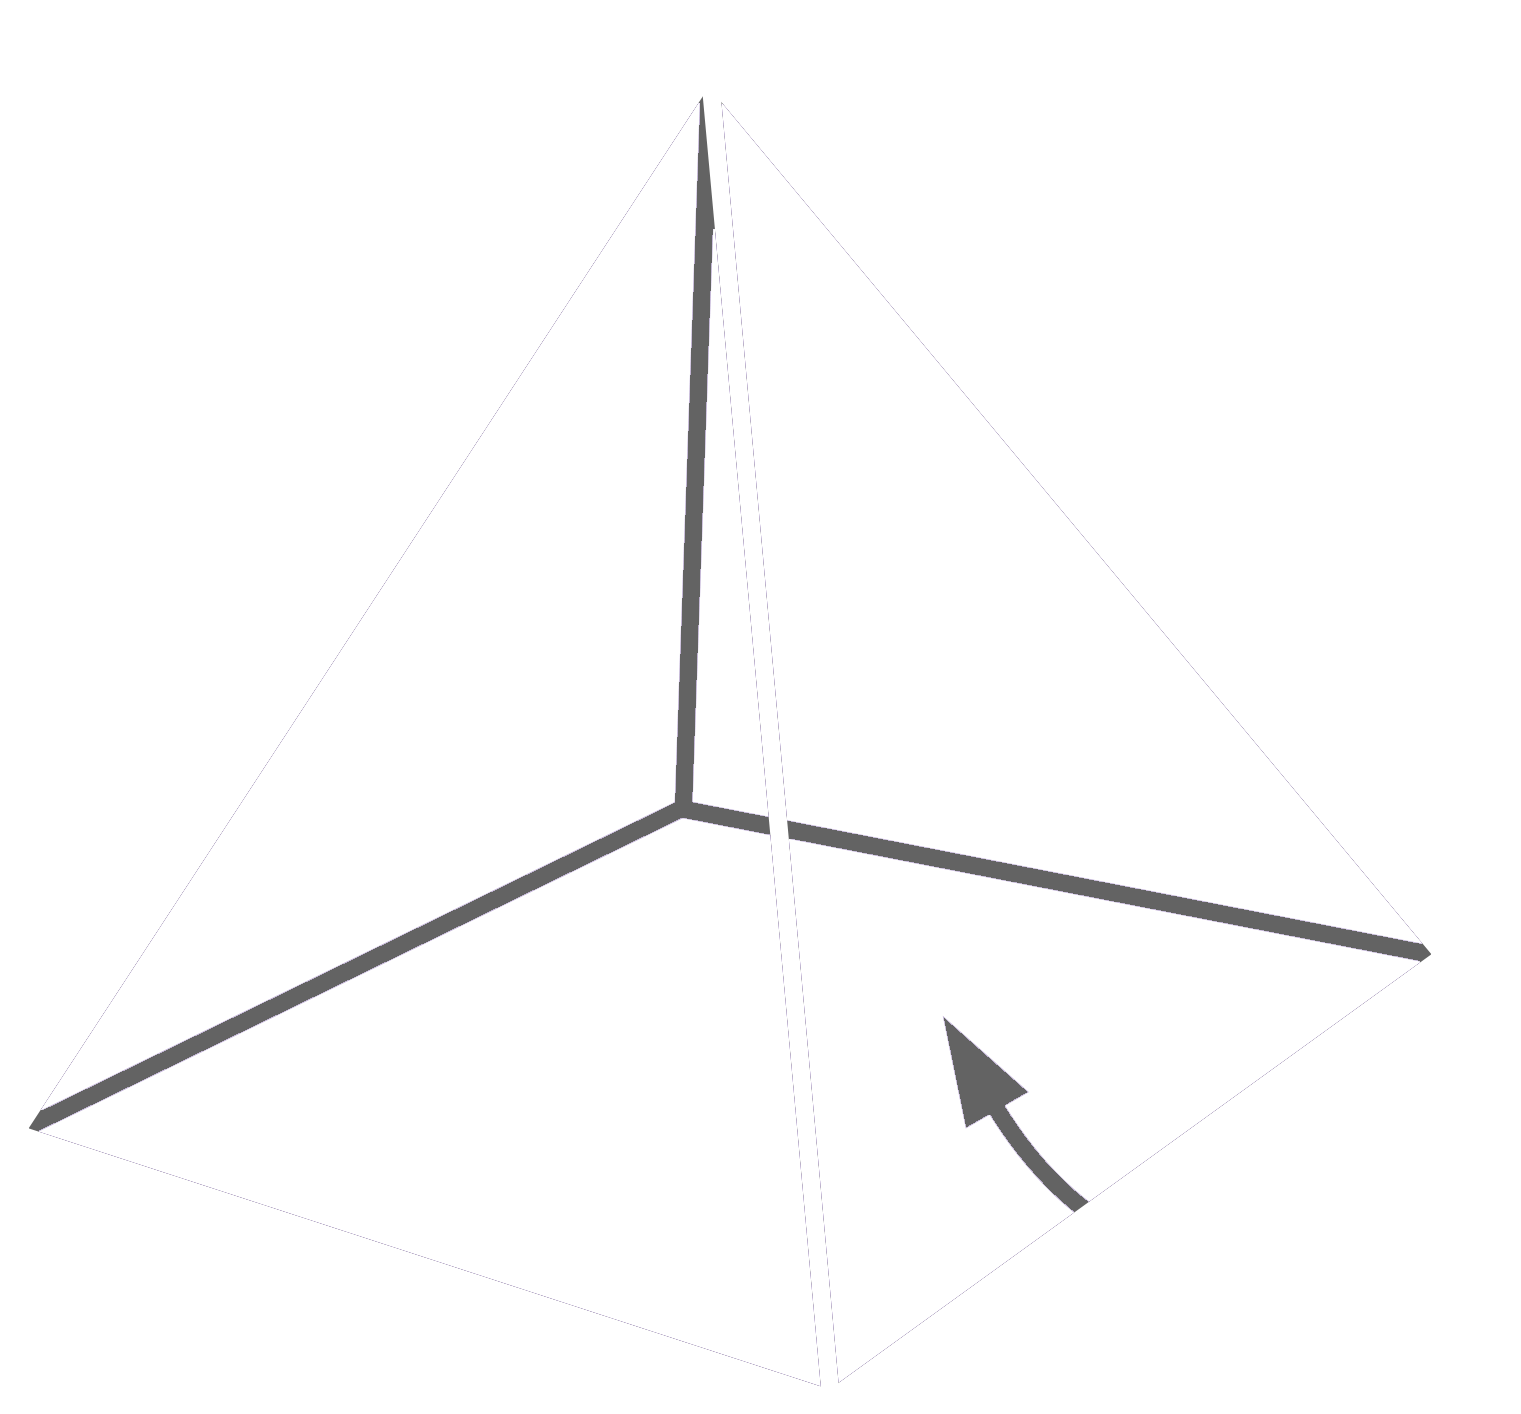 A Very Primitive Pyramid